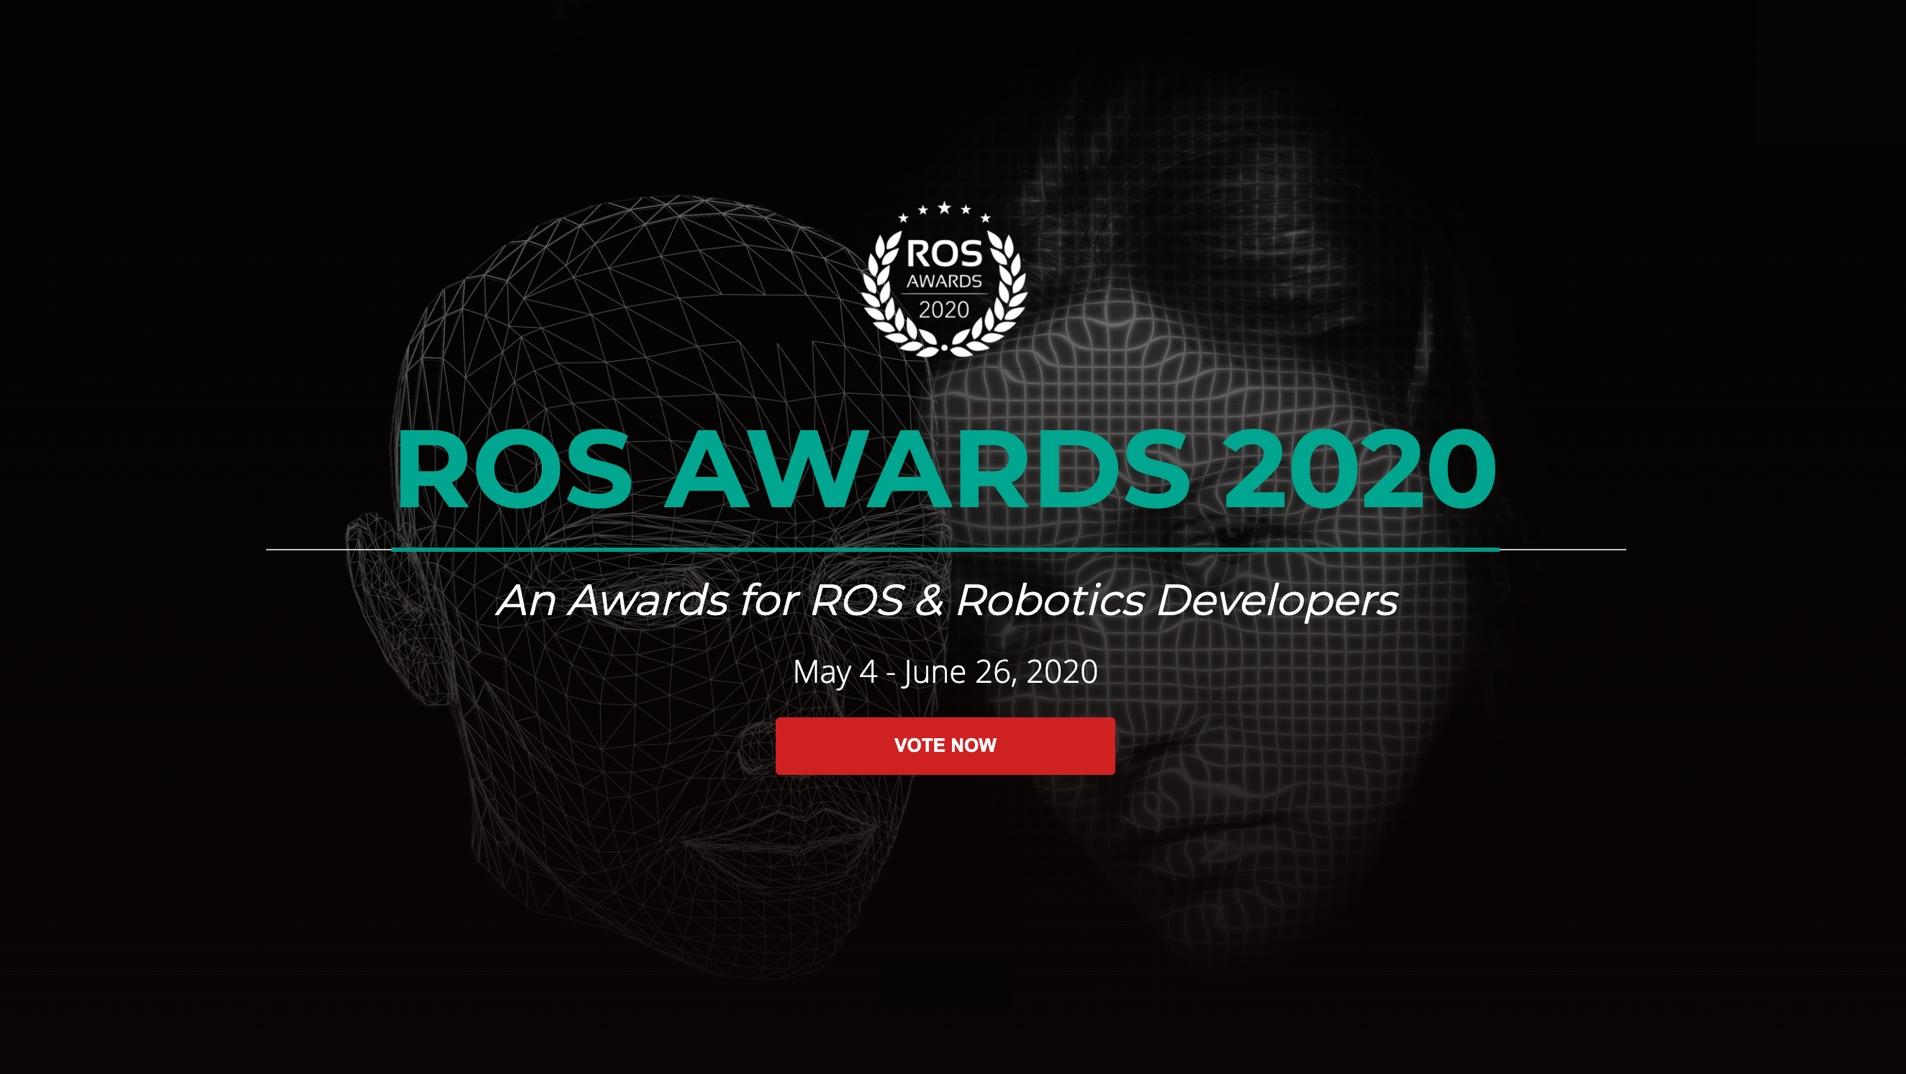 ROS Awards 2020 Results